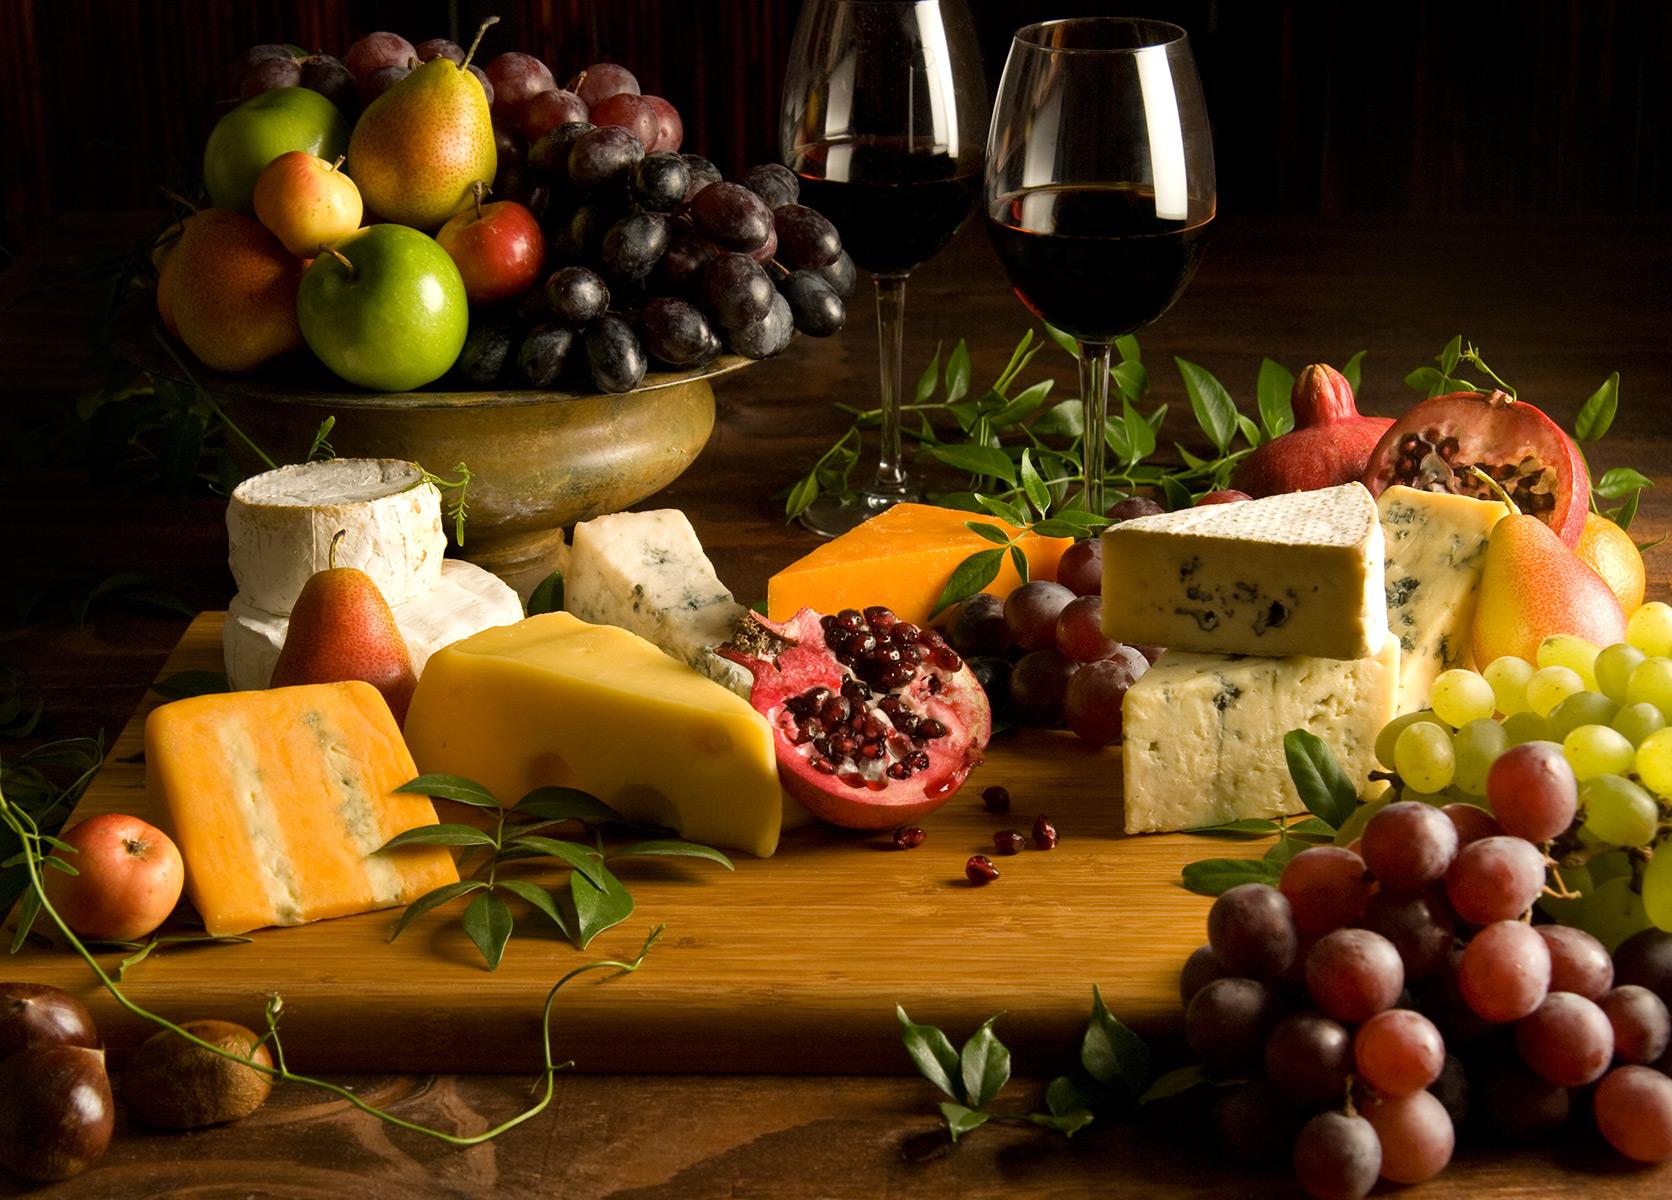 Cheese board-Carl Kravats food photographer